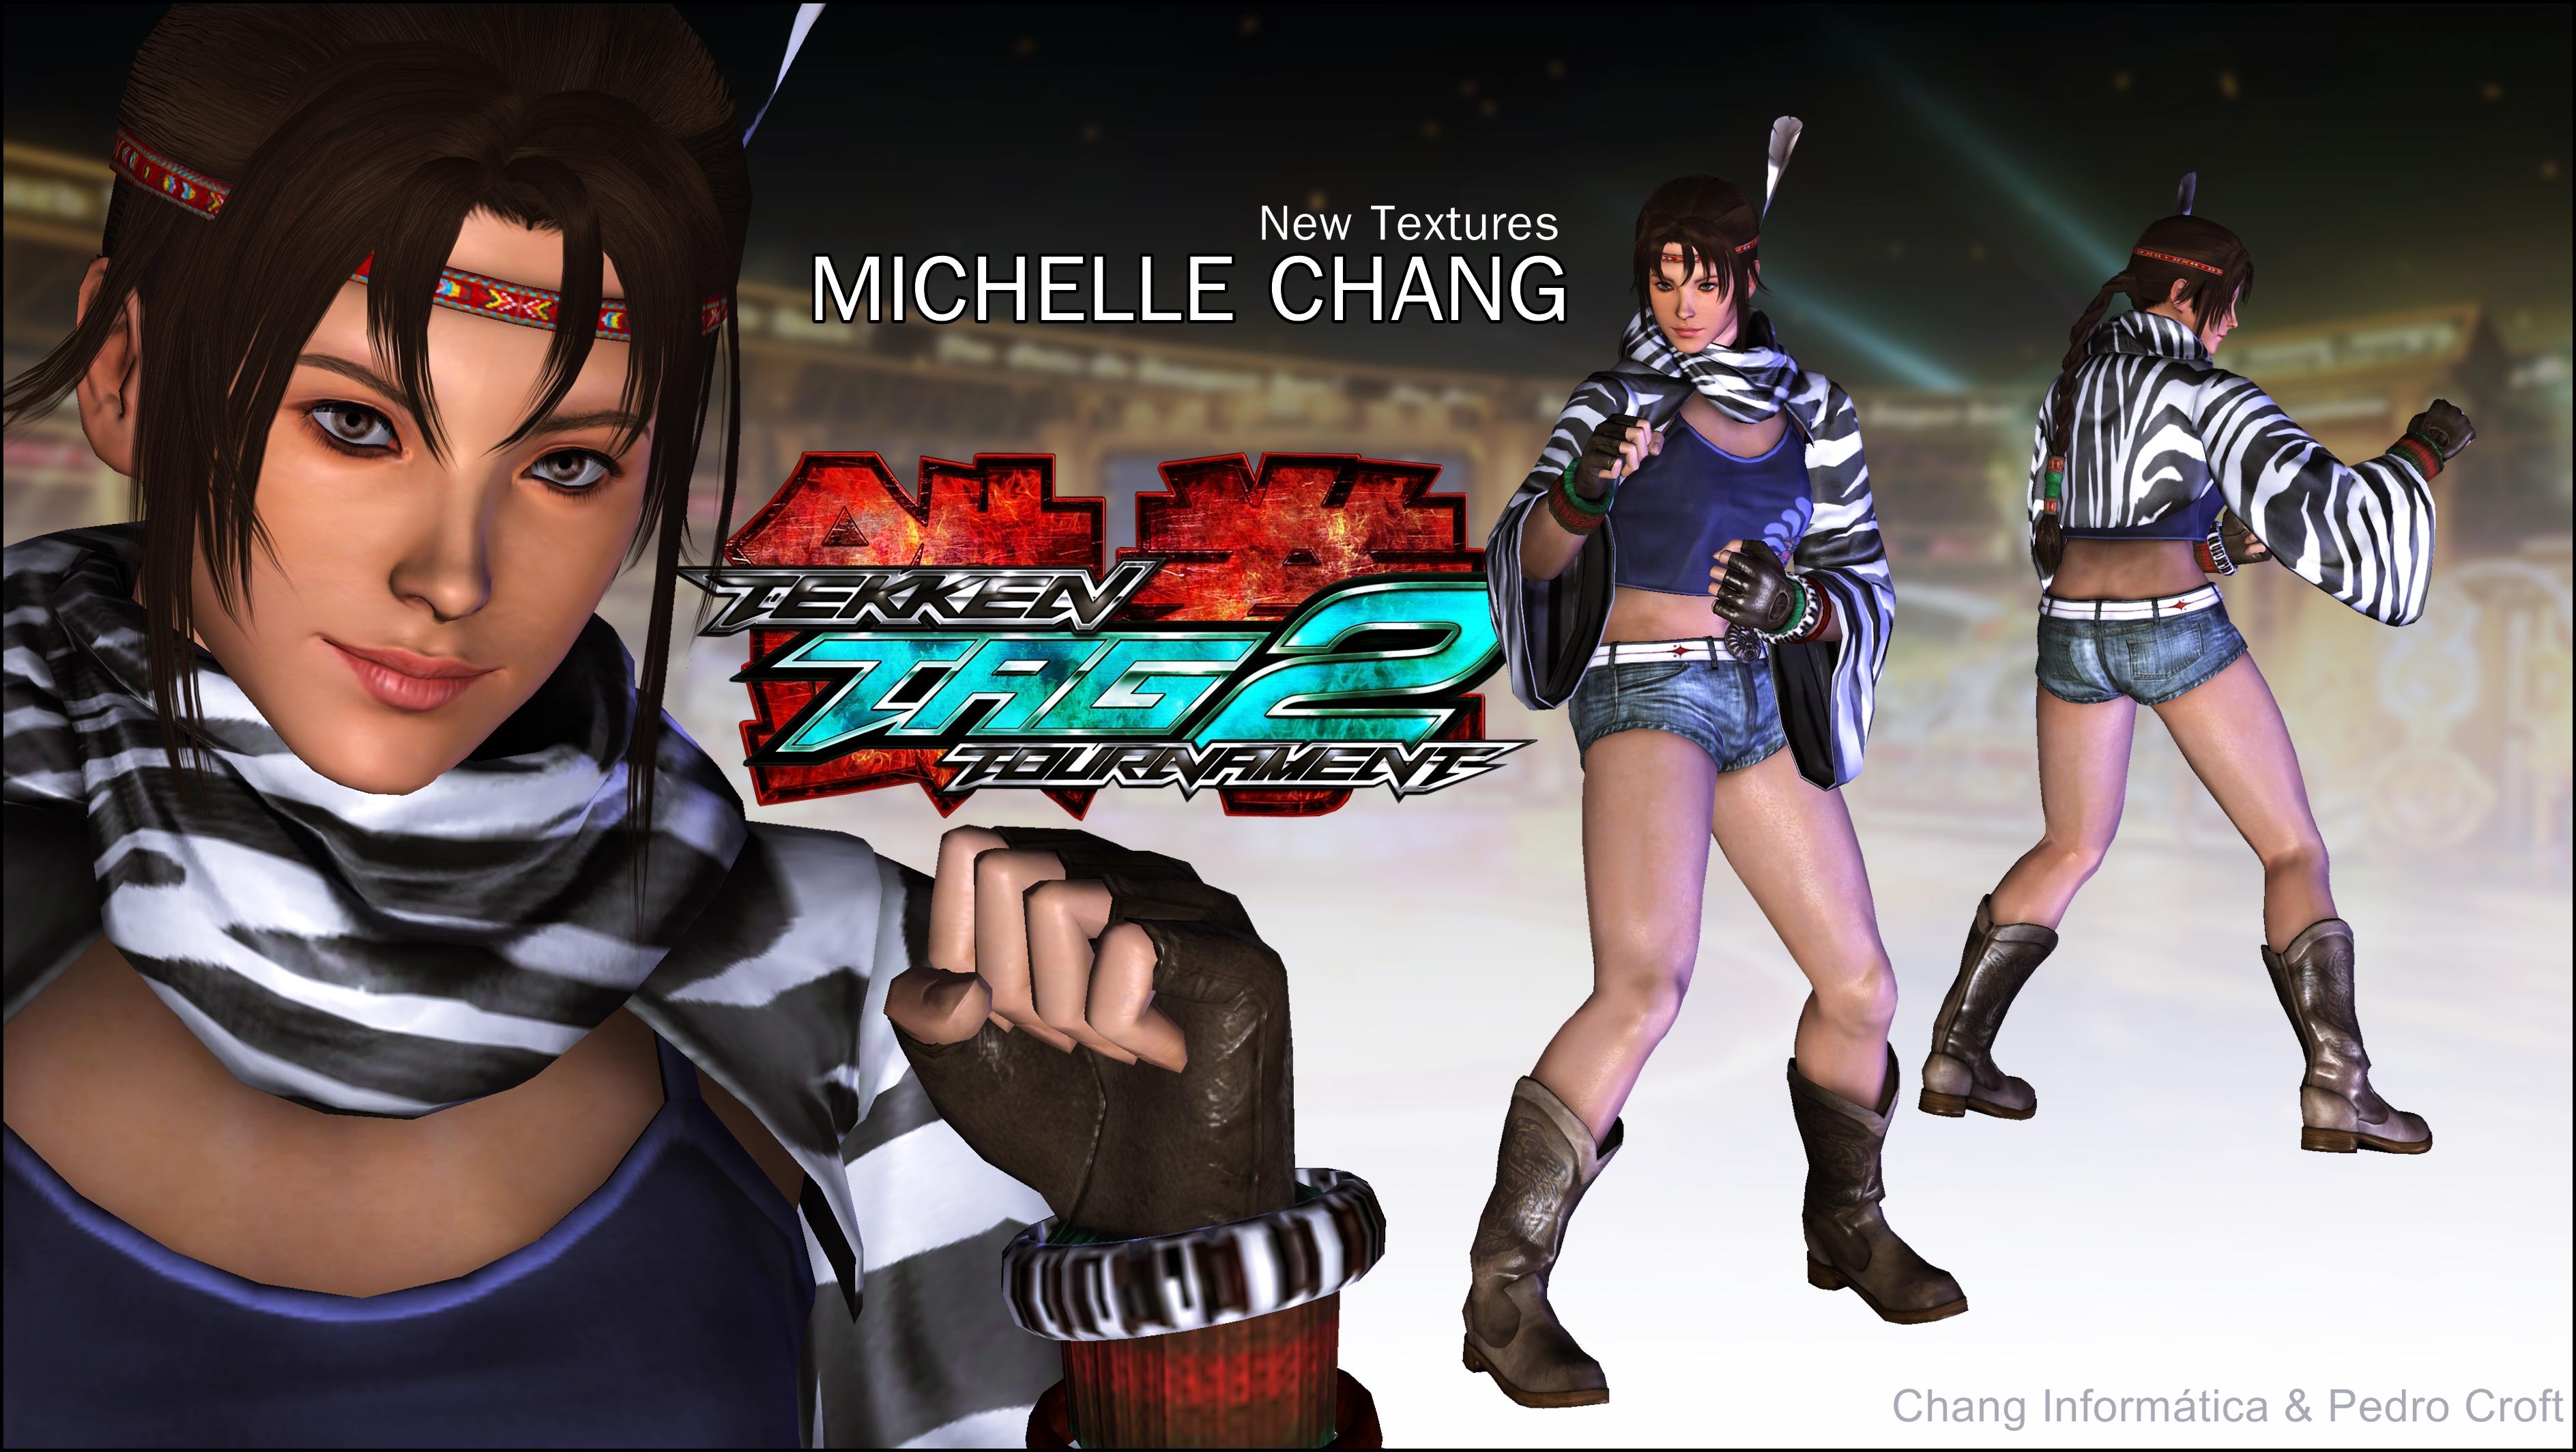 michelle chang - ttt2|new textures (xps download)pedro-croft on